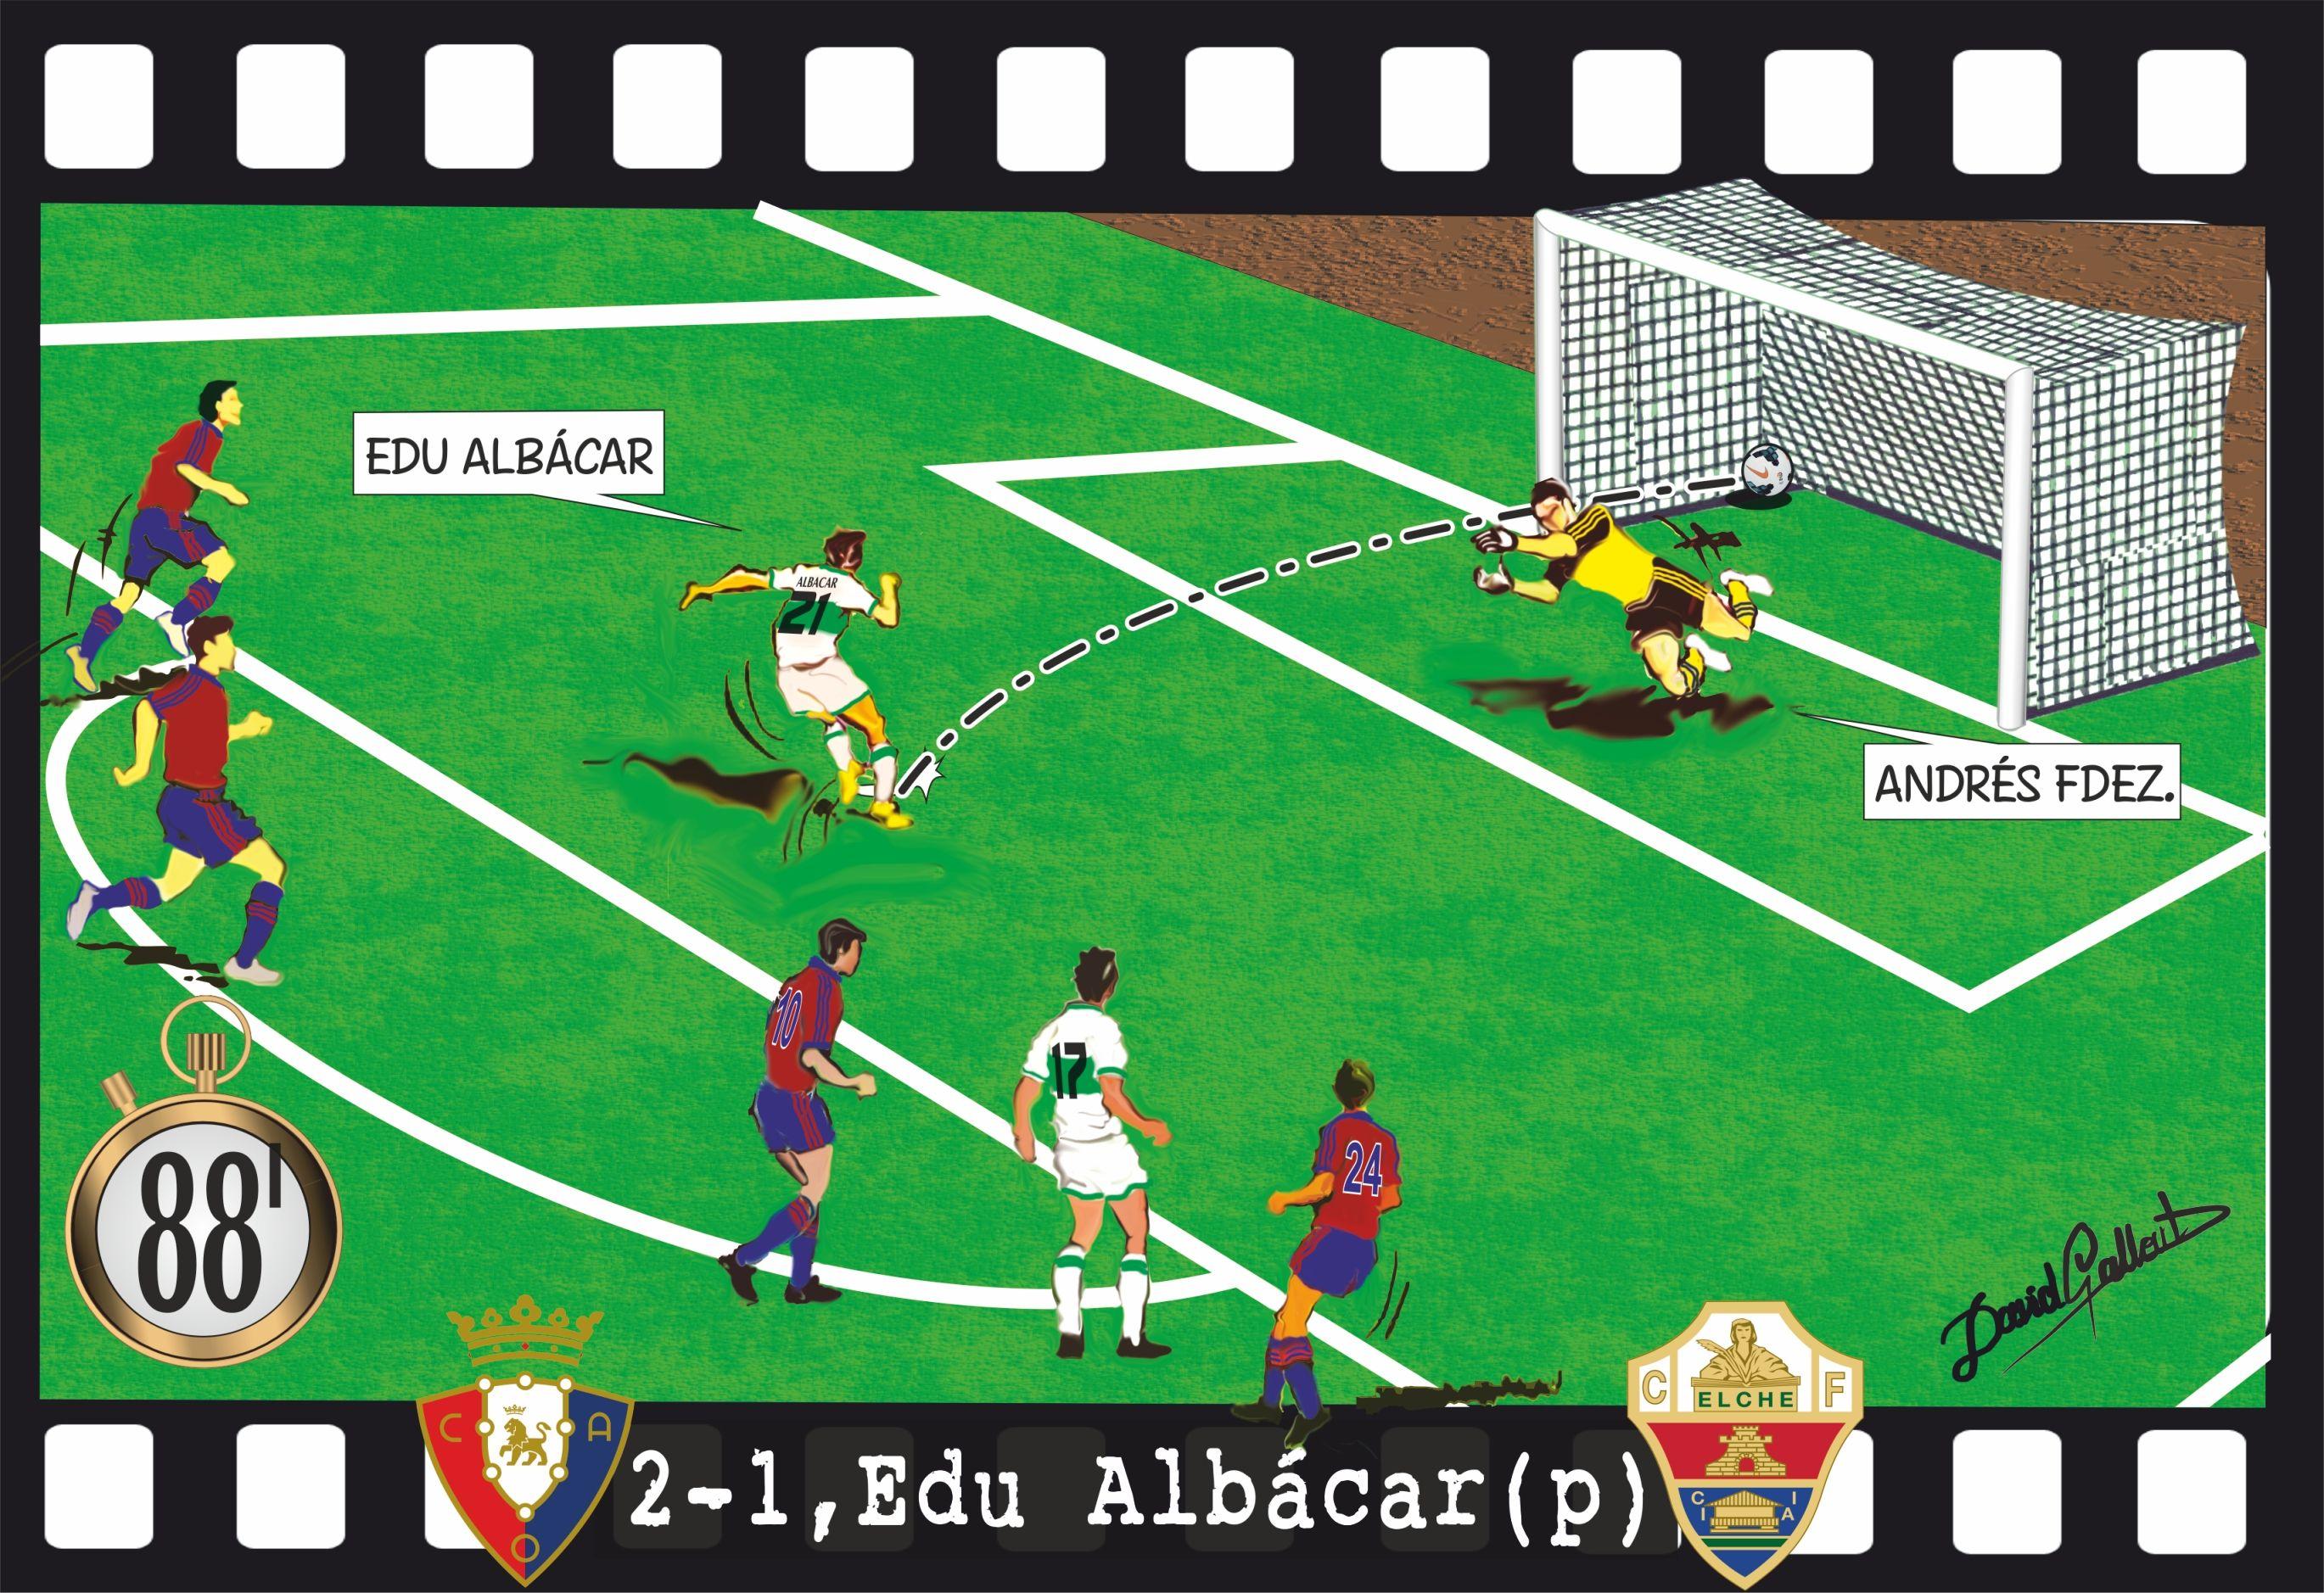 Osasuna - Elche, 2-1, Edu Albácar